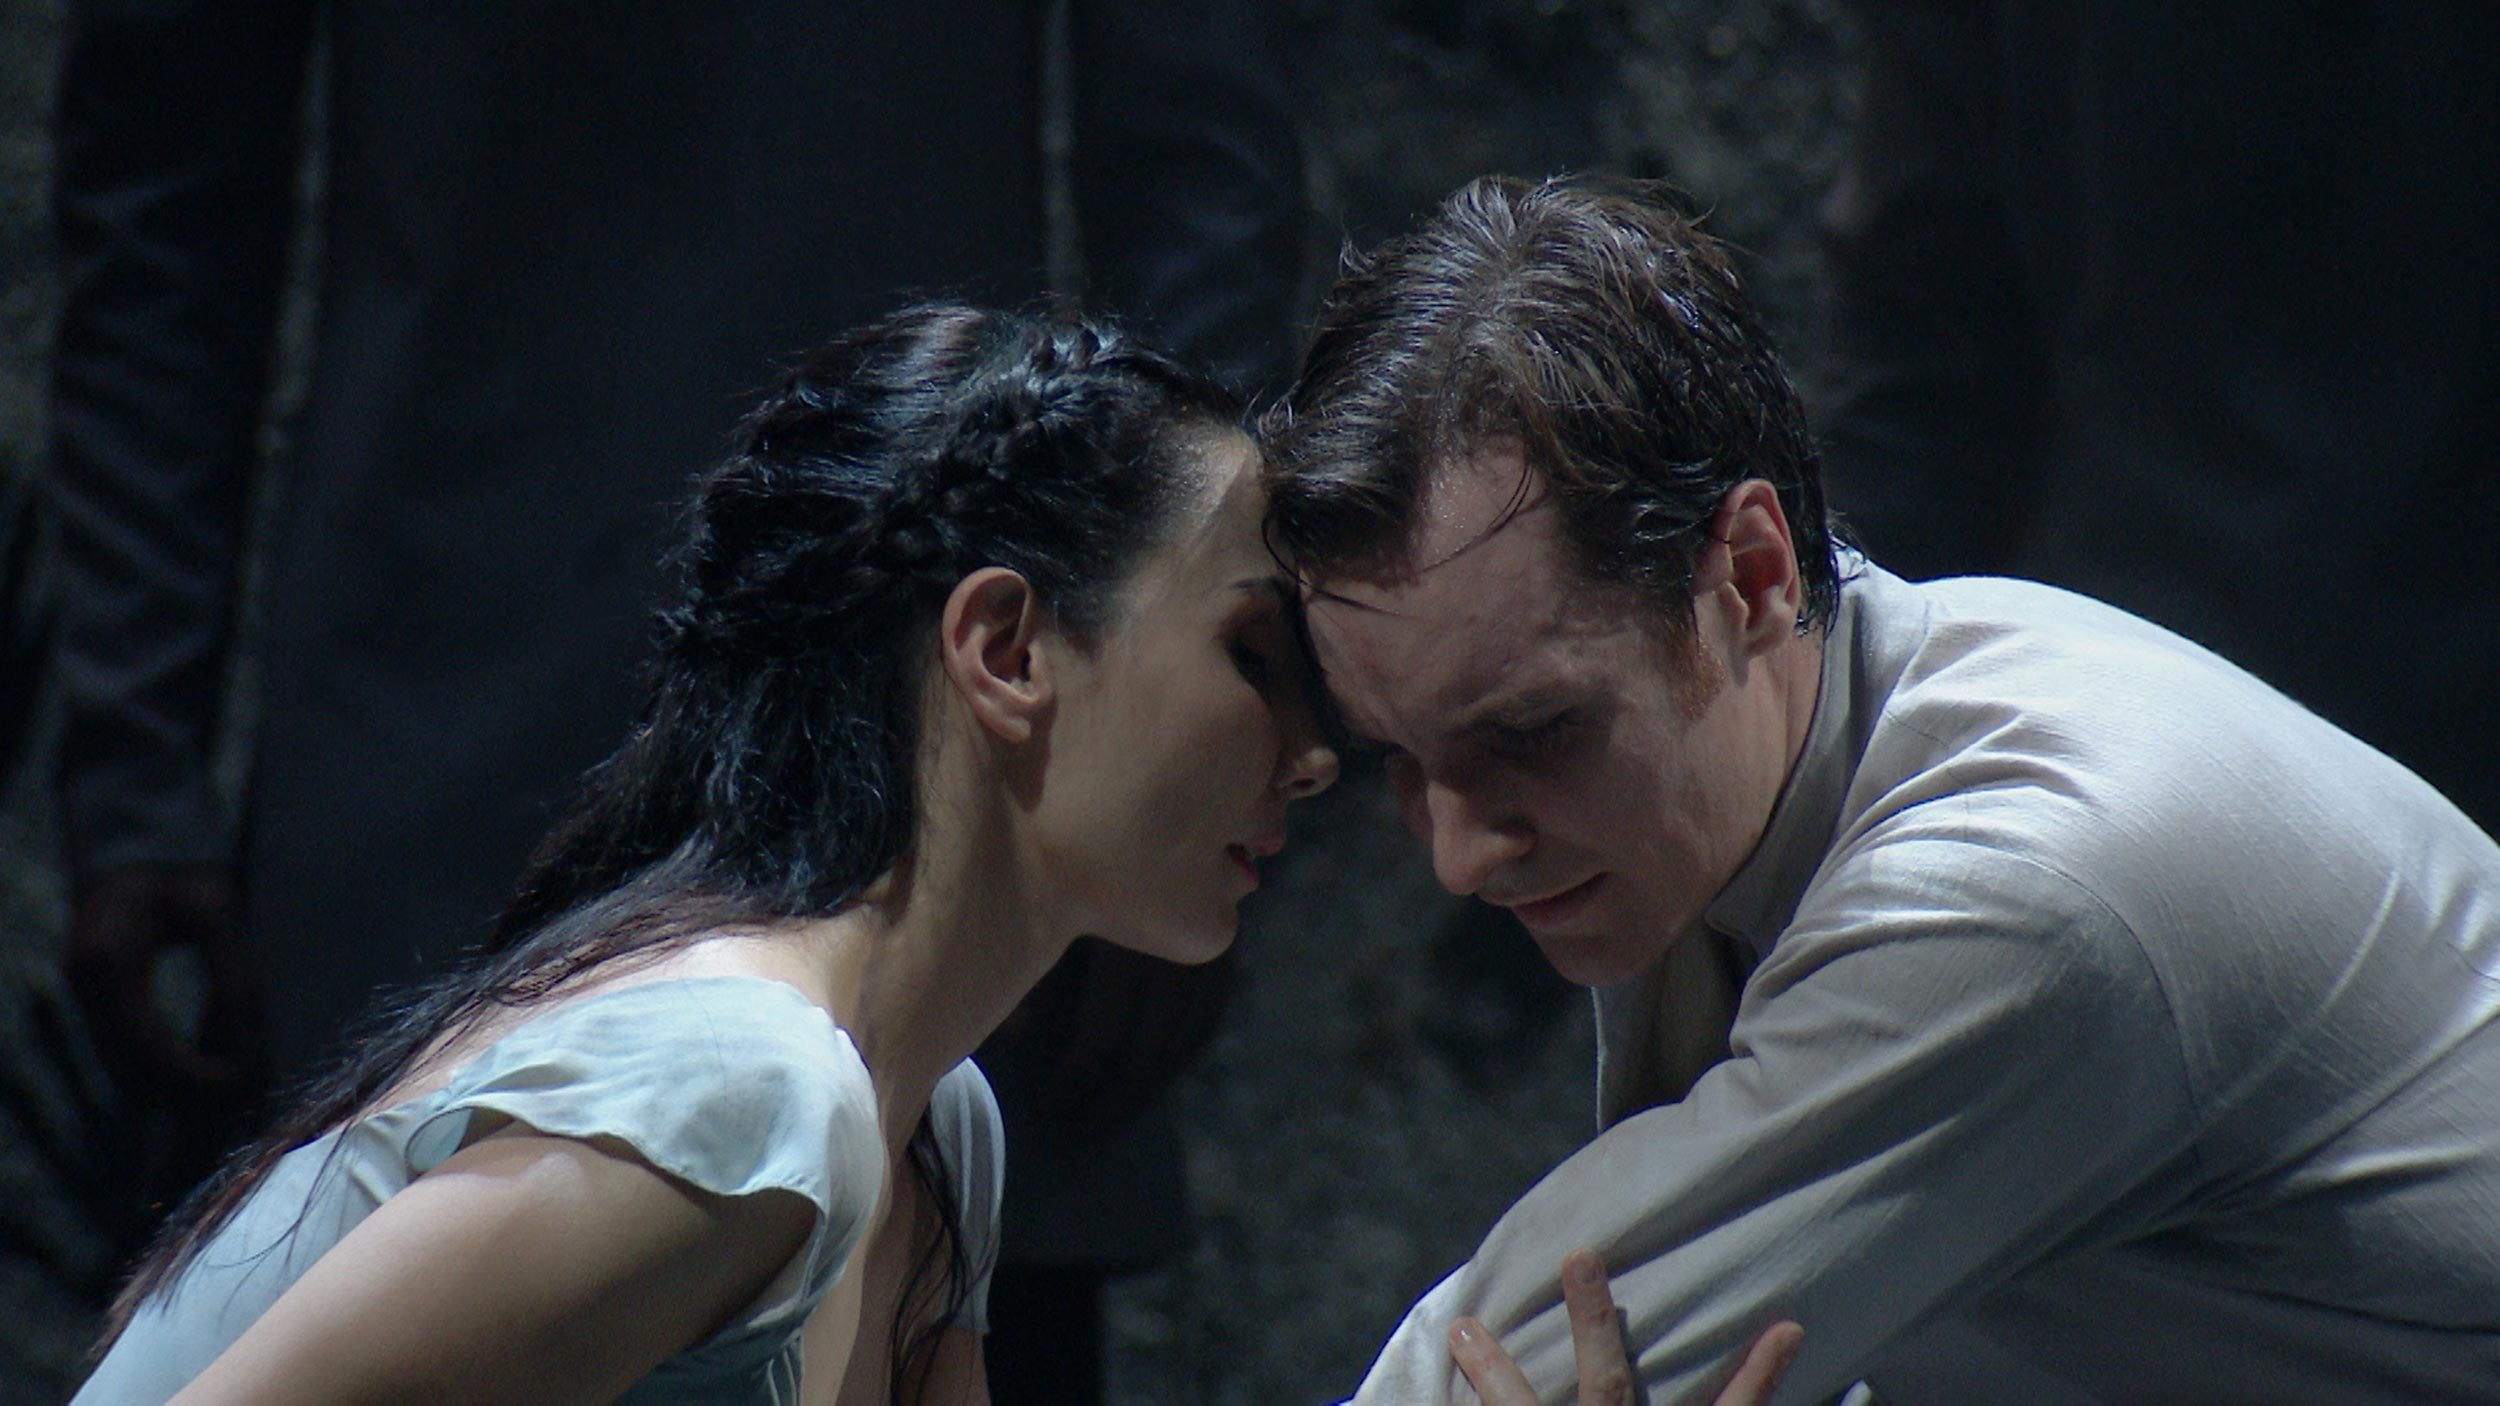 Tamara-Rojo-and-James-Streeter-in-Akram-Khan's-Giselle-©-English-National-Ballet